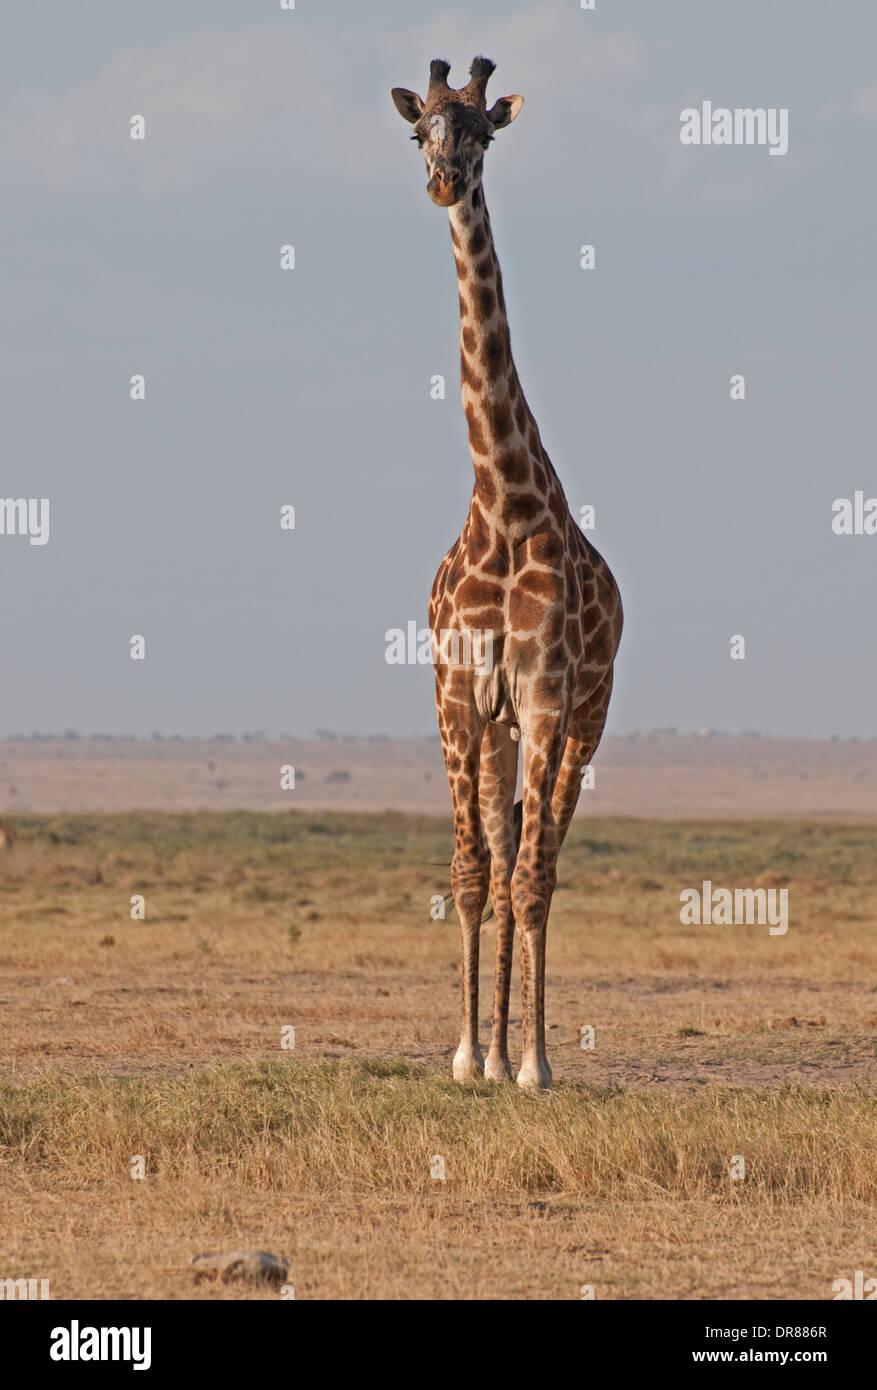 Jirafa común en el Parque Nacional Amboseli Kenia África Oriental Imagen De Stock